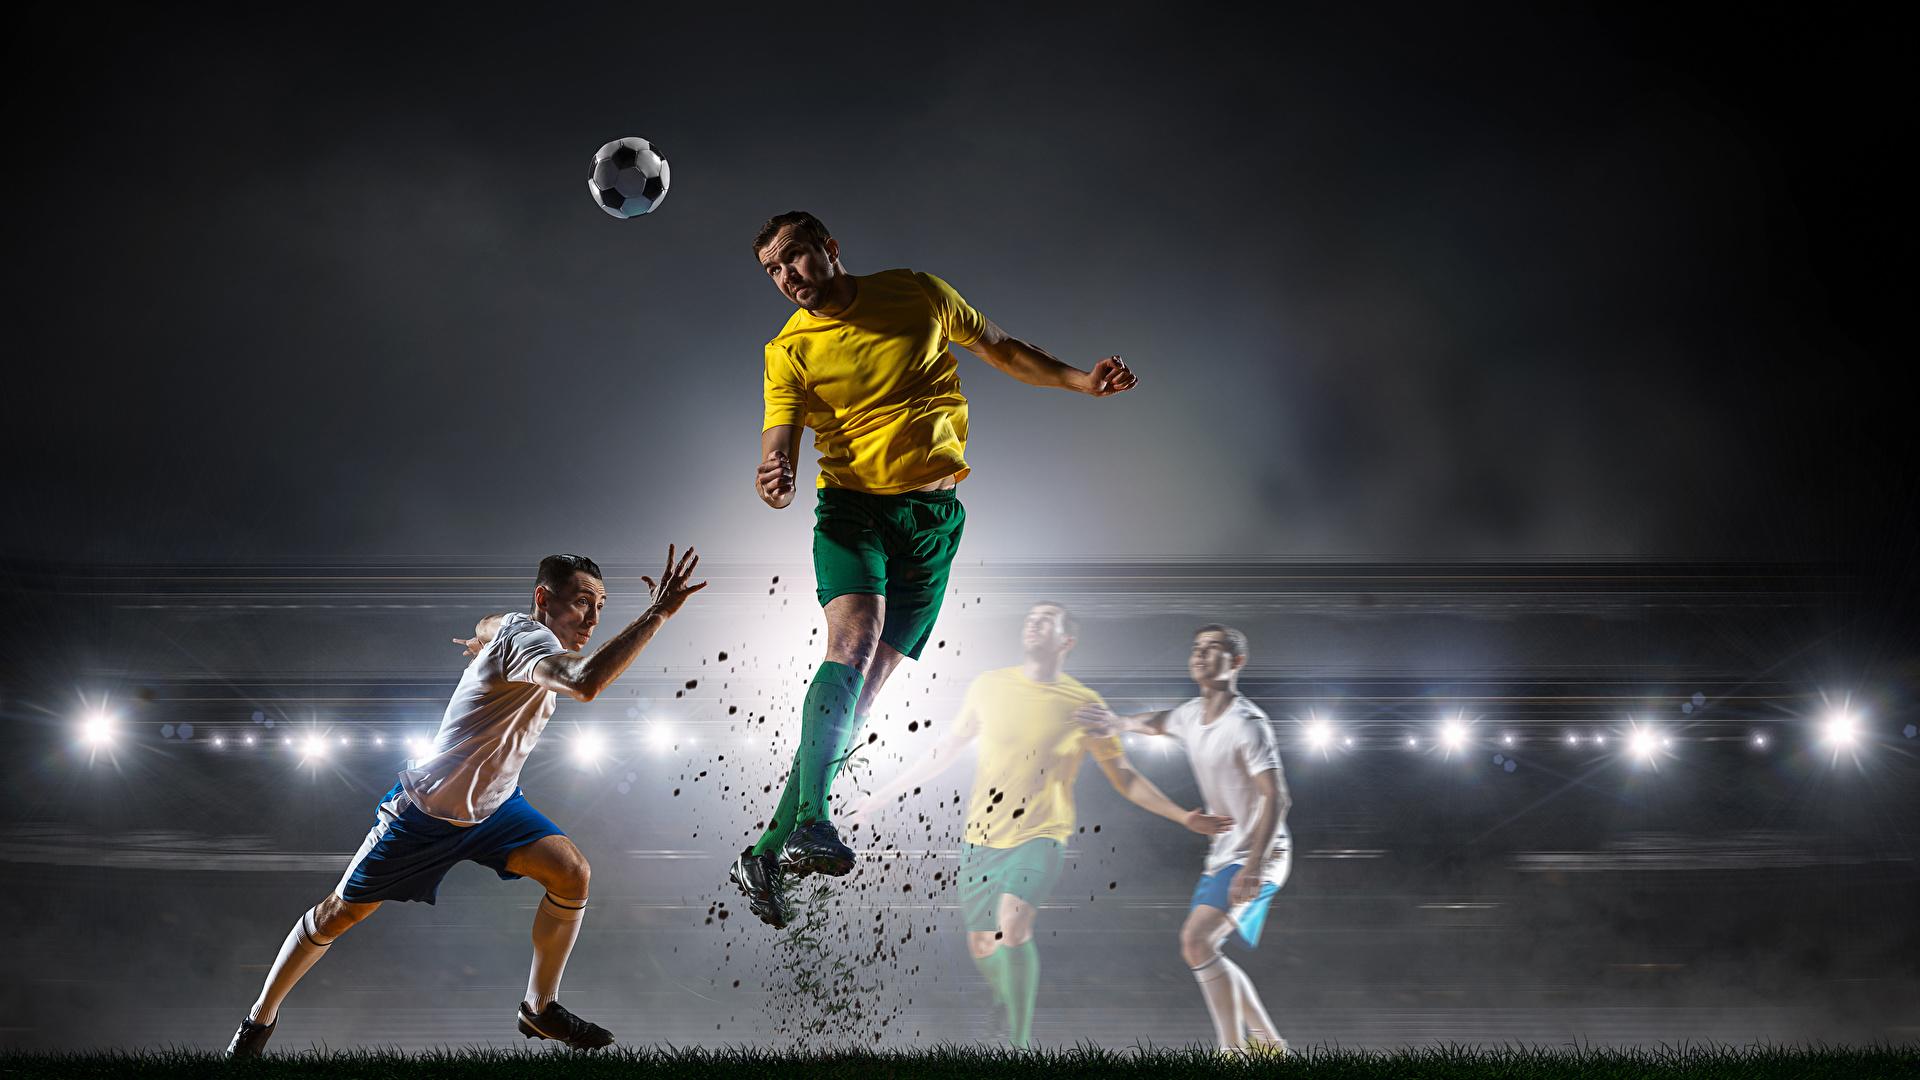 Обои футболисты. Спорт foto 11